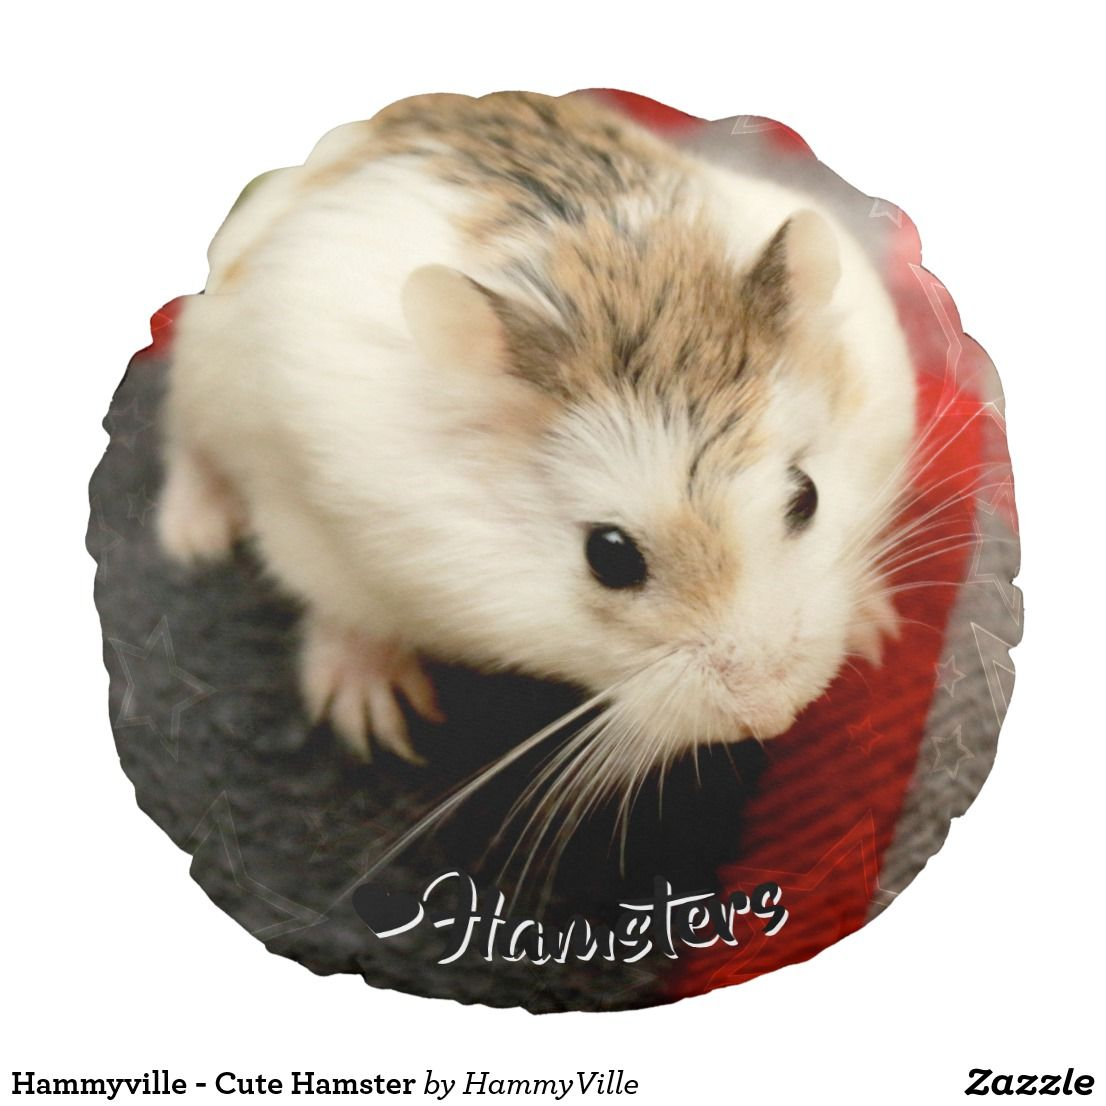 Hammyville Cute Hamster Round Pillow Hammyville Hamster Personalized Personalizedgifts Cuteanimals Shopping Gifts Gif Cute Hamsters Cute Cute Animals